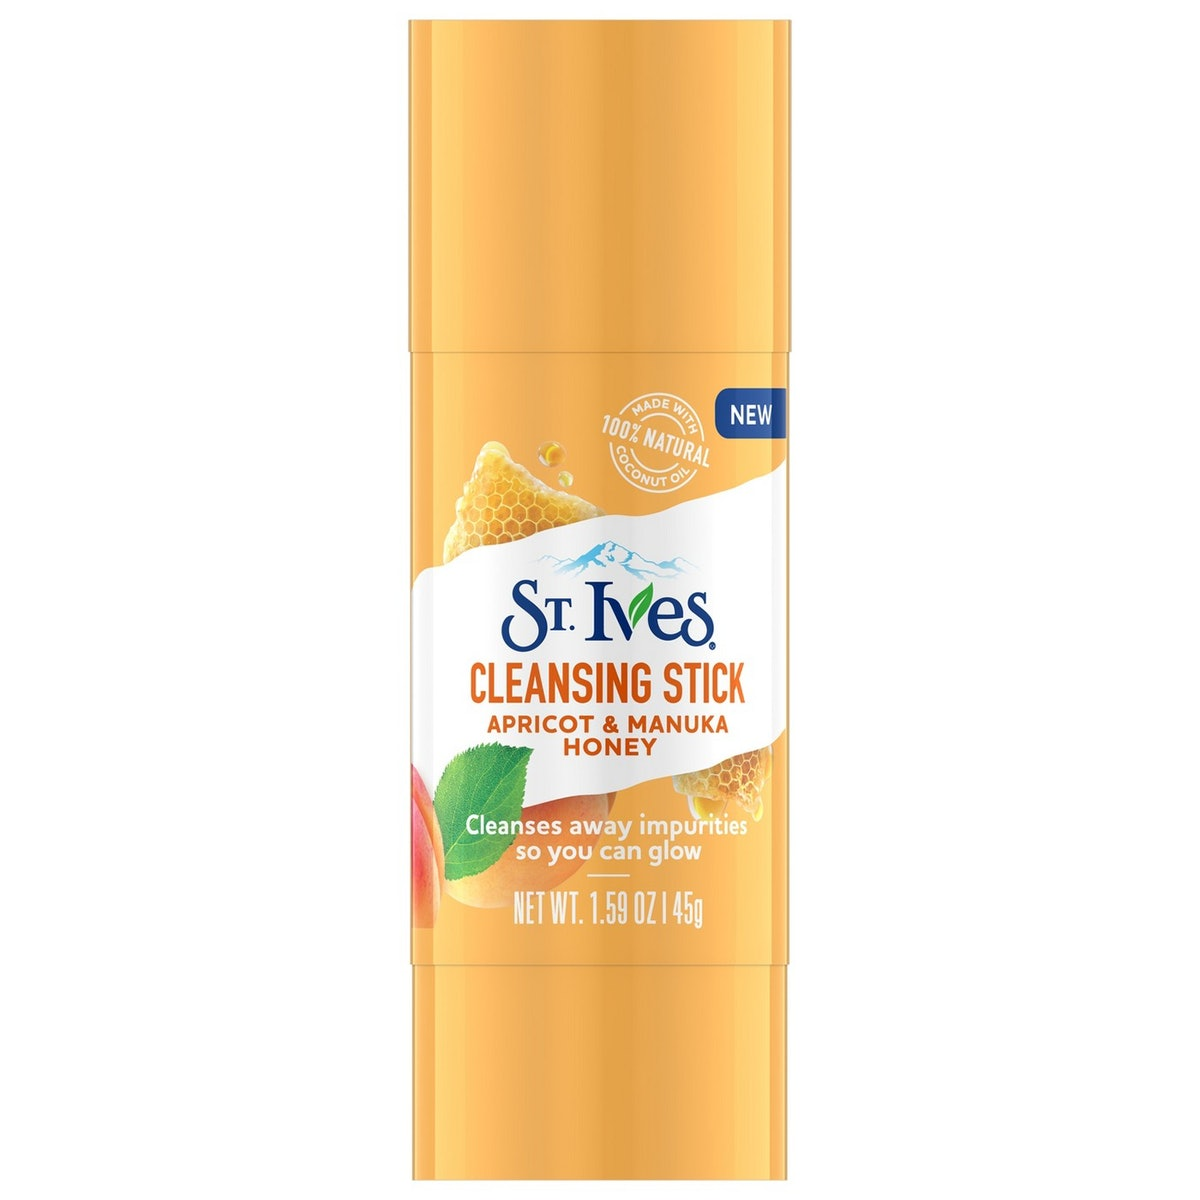 St. Ives Glow Apricot & Manuka Honey Cleansing Stick